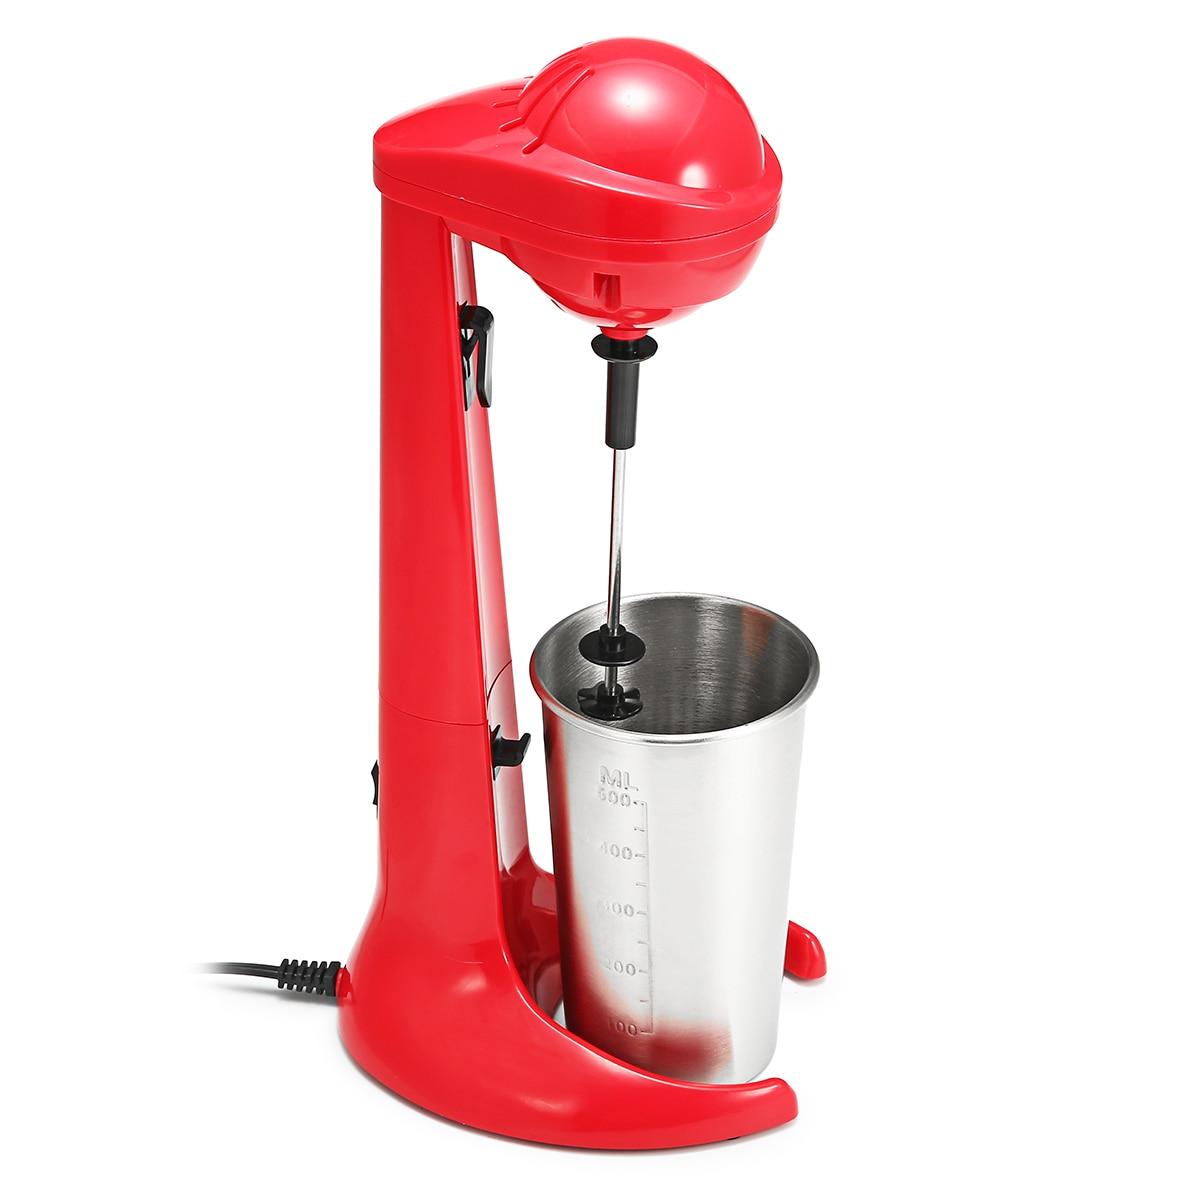 Multifunctional Food Mixer Coffee Mixing Blenders Milk Milkshake Maker Ice Cream Smoothies Shakes Cocktail Maker Kitchen Machine